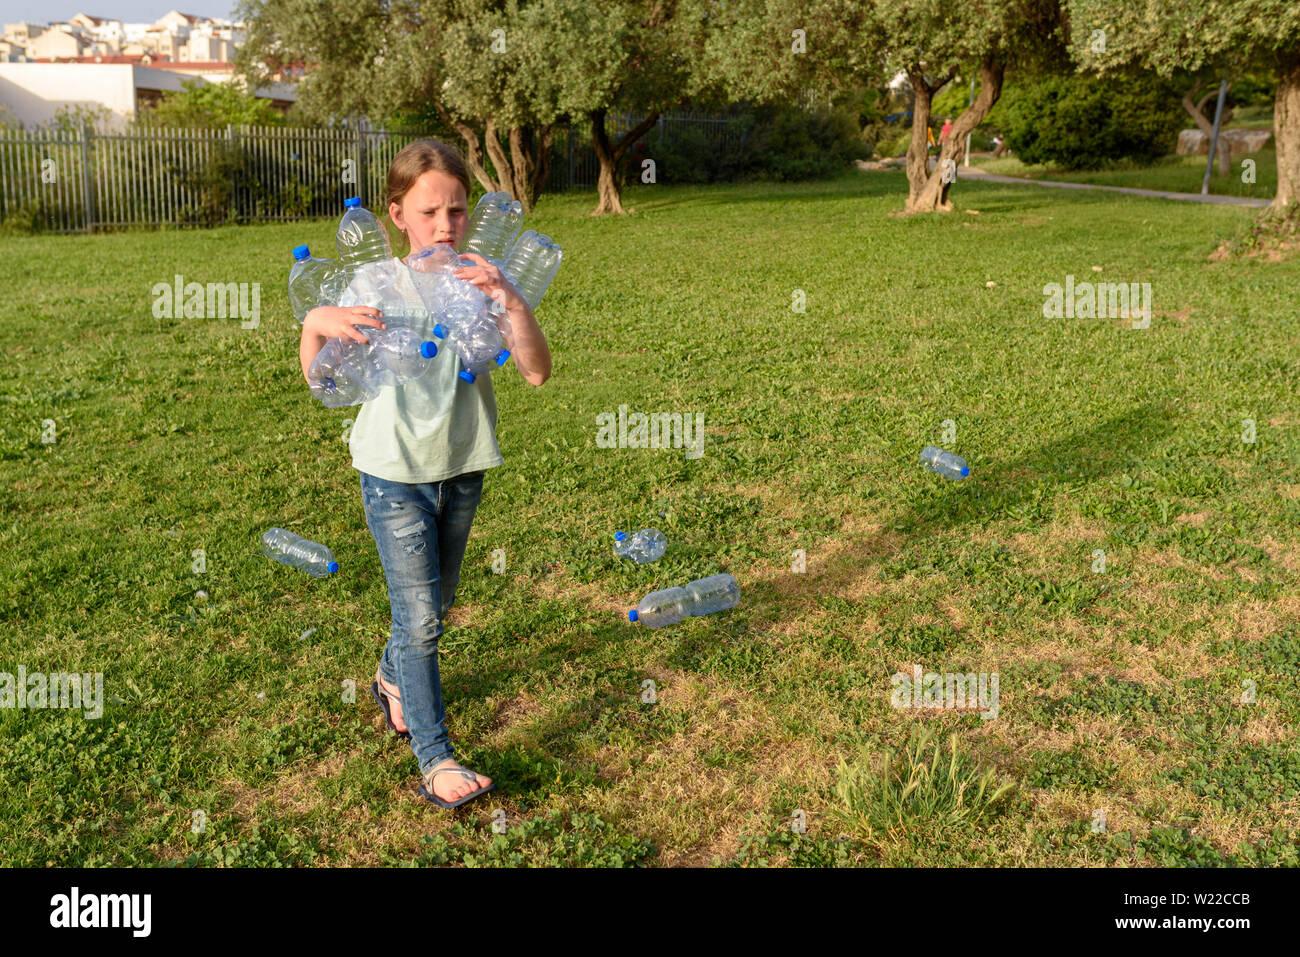 Young teenage girl recycling plastic bottles Kid volunteer cleaning